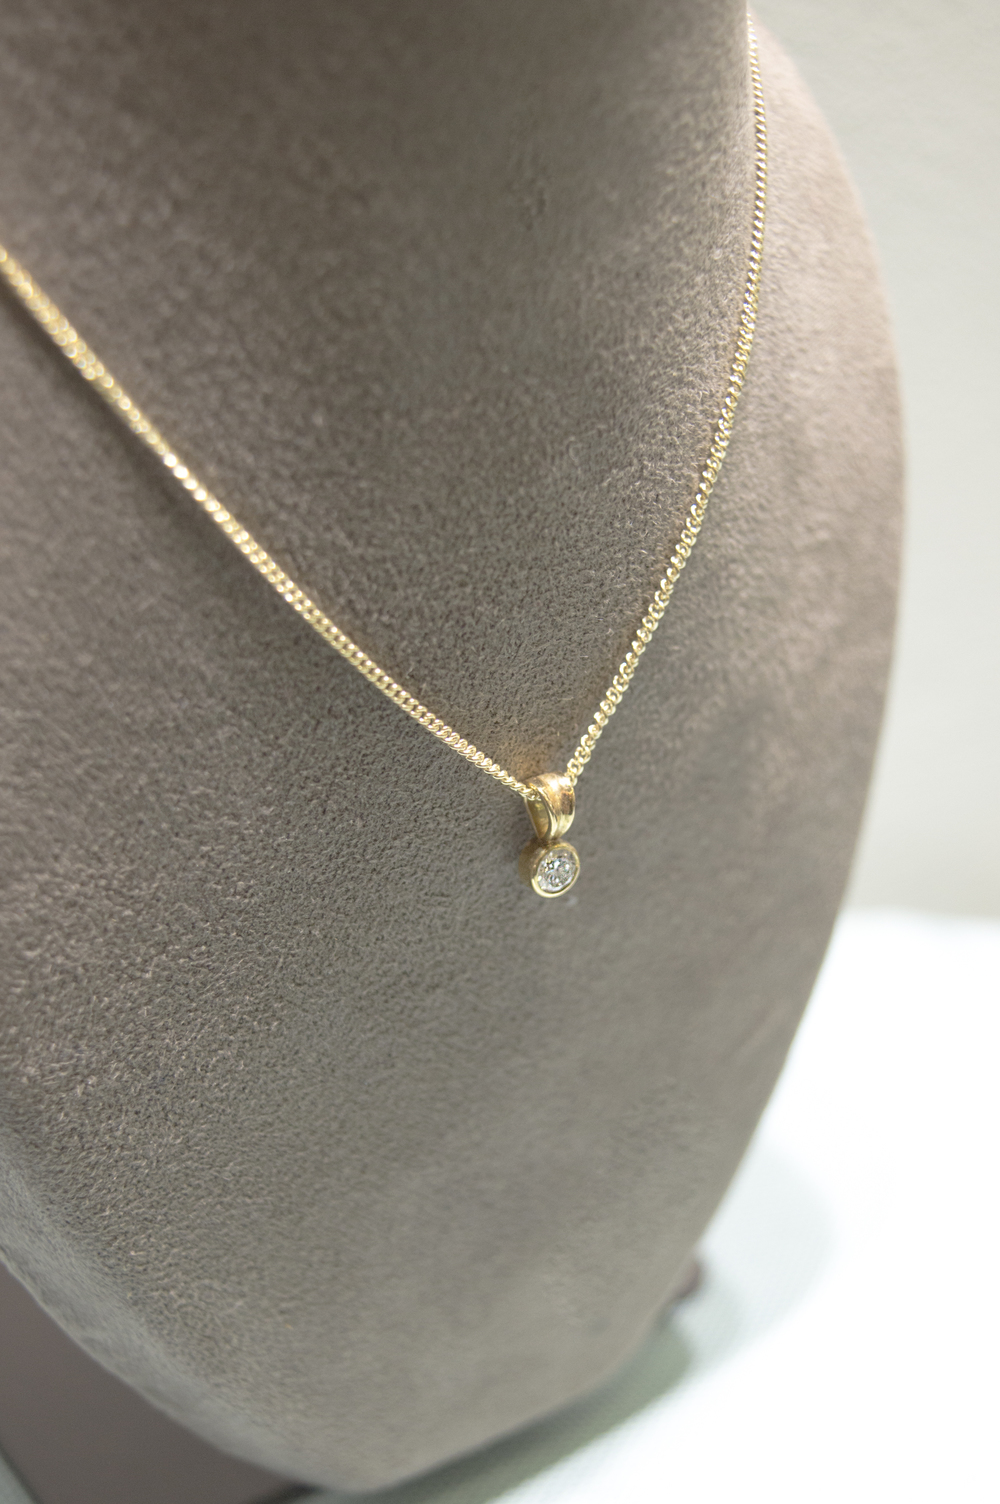 £350 - 20pt Diamond 9ct Gold Pendant